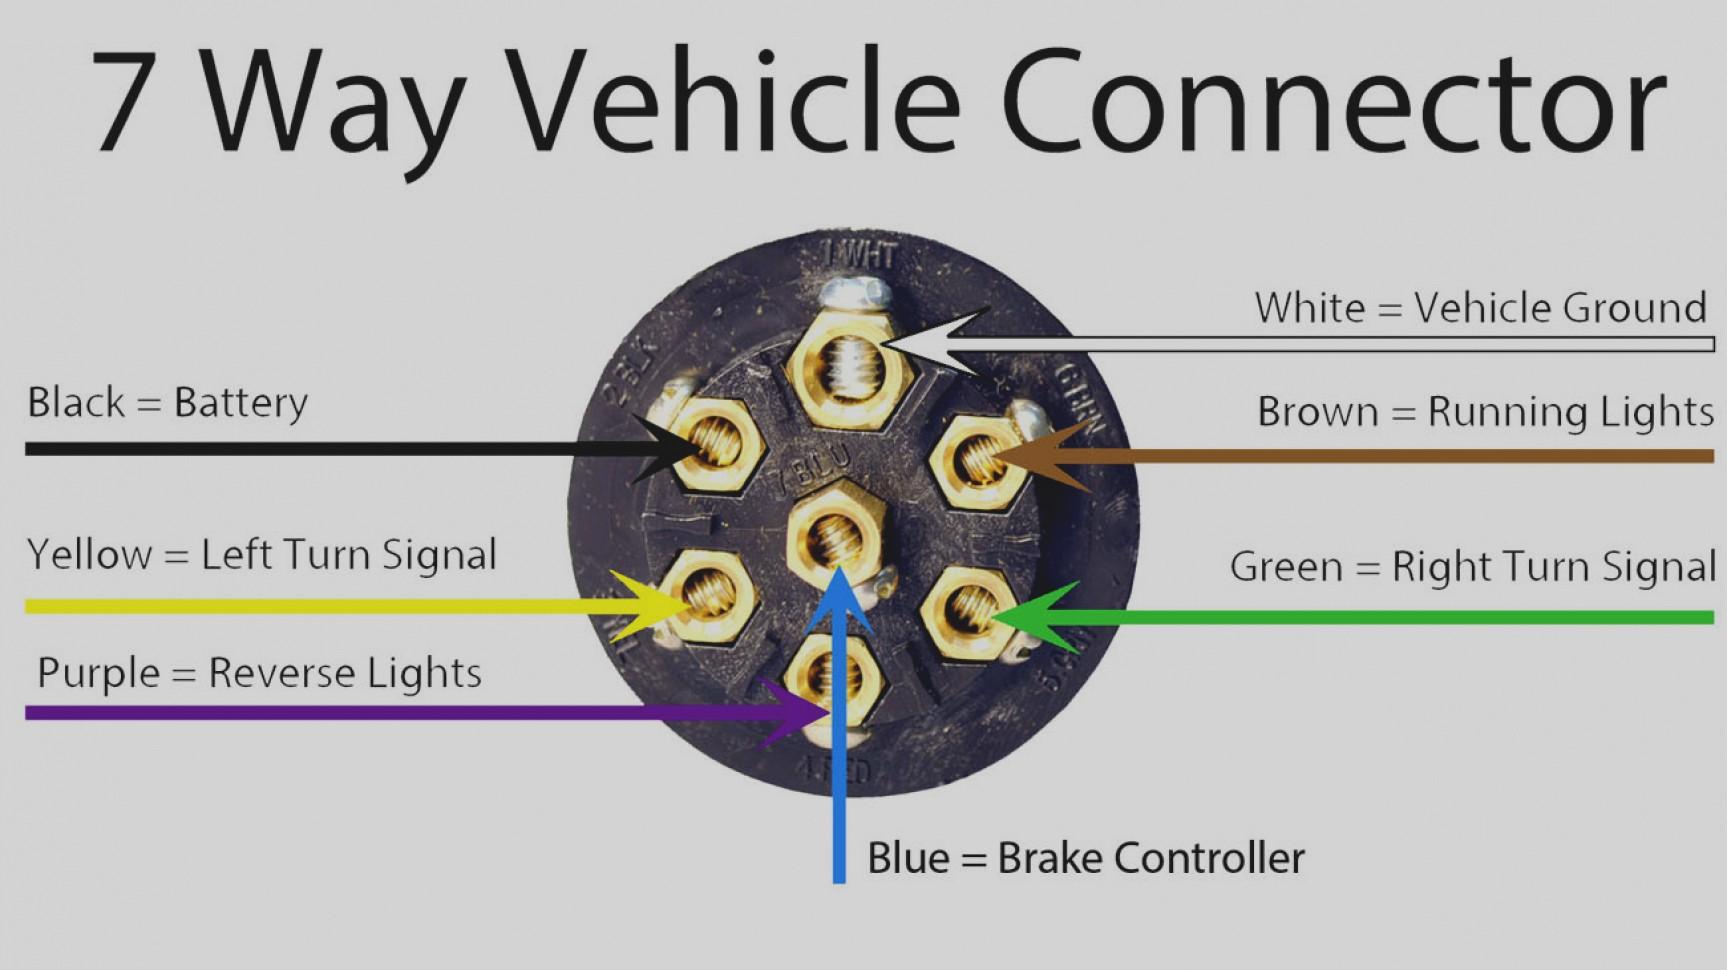 Collection 7 Way Trailer Connector Wiring Diagram WIRING DIAGRAM